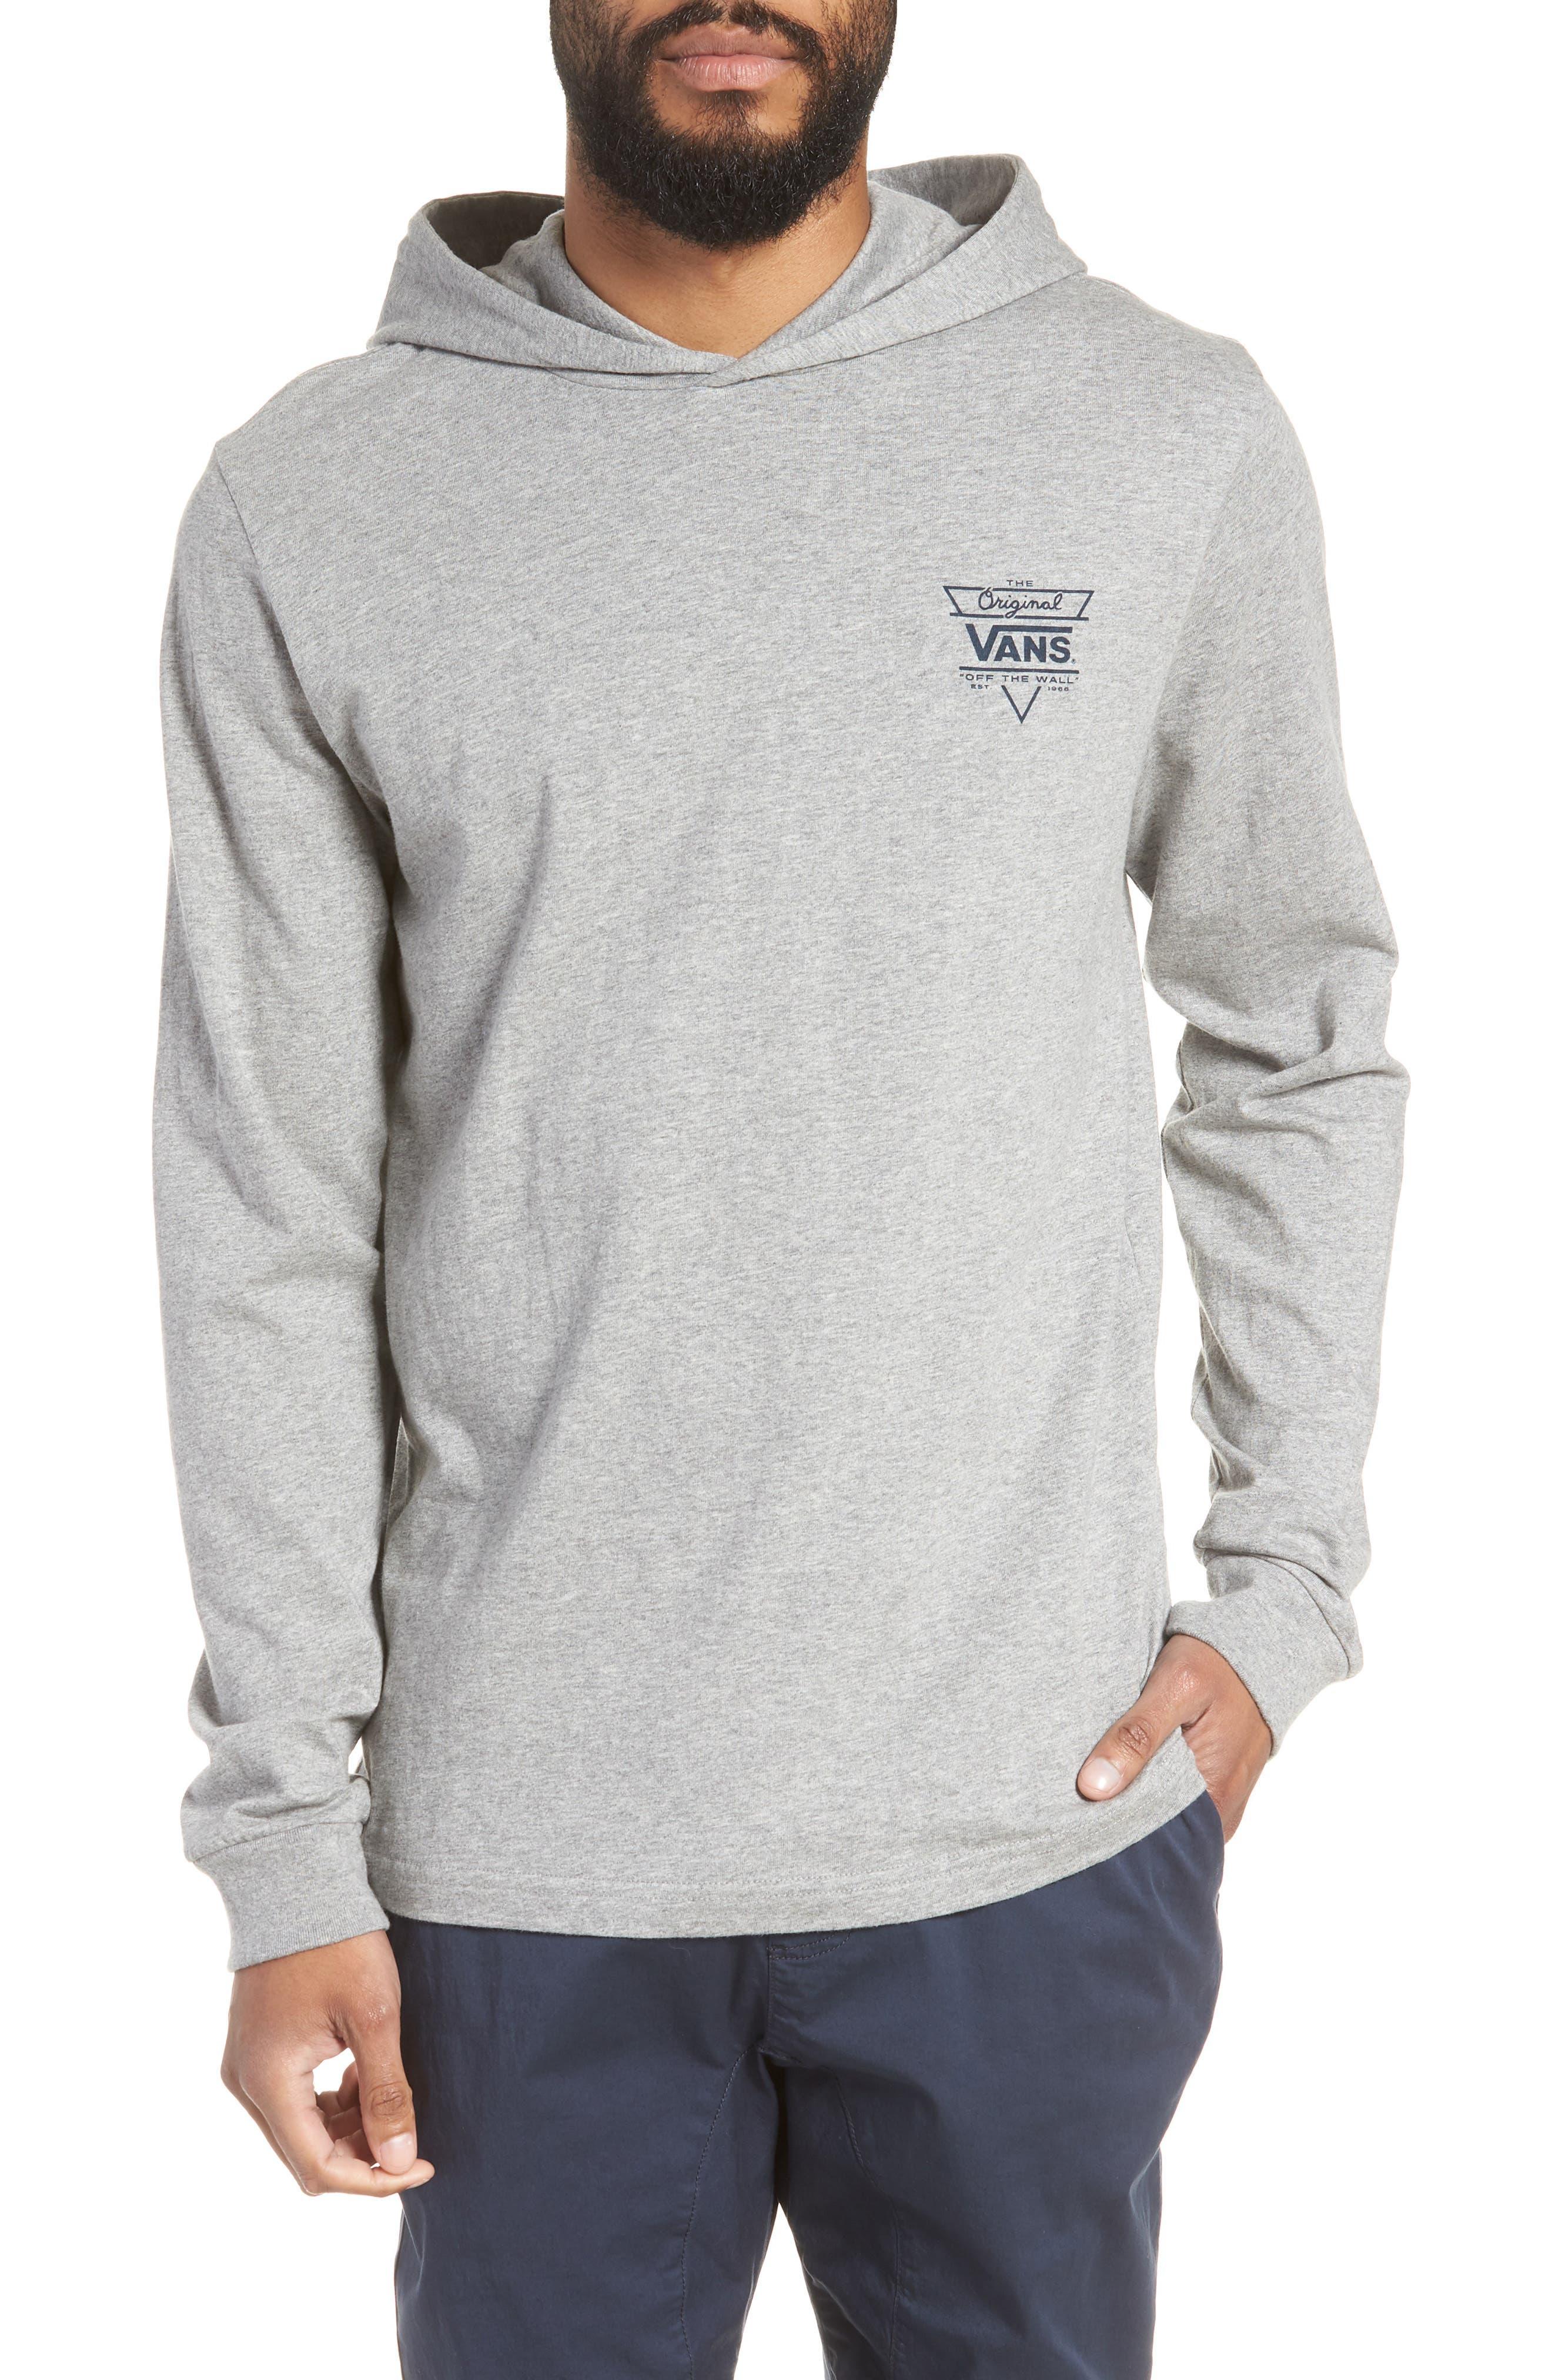 Van Doren Hooded T-Shirt,                         Main,                         color, Cement Heather/ Dress Blues